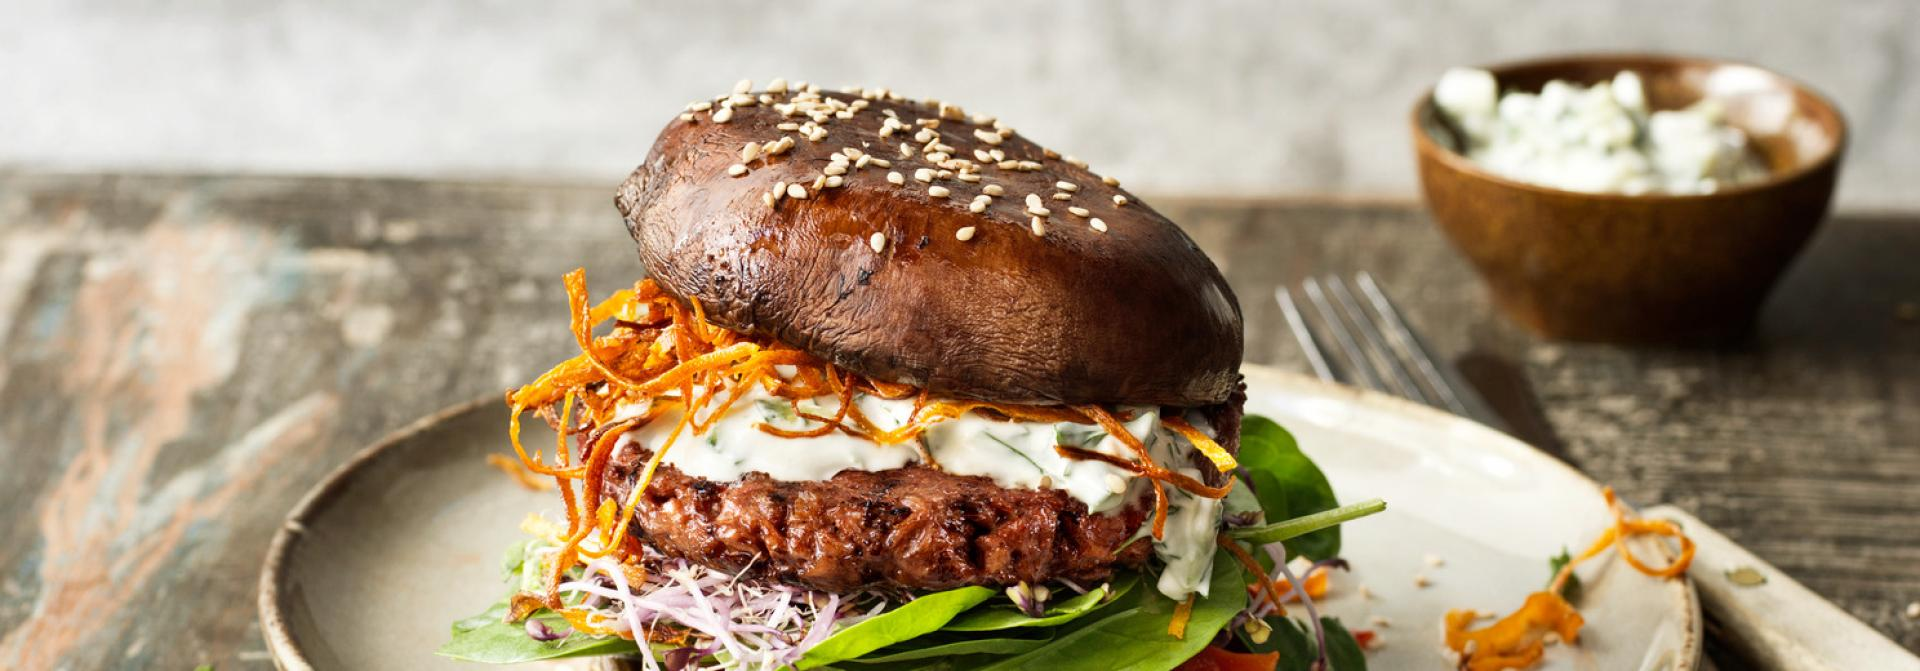 Vegan Sensational Portobello Burger